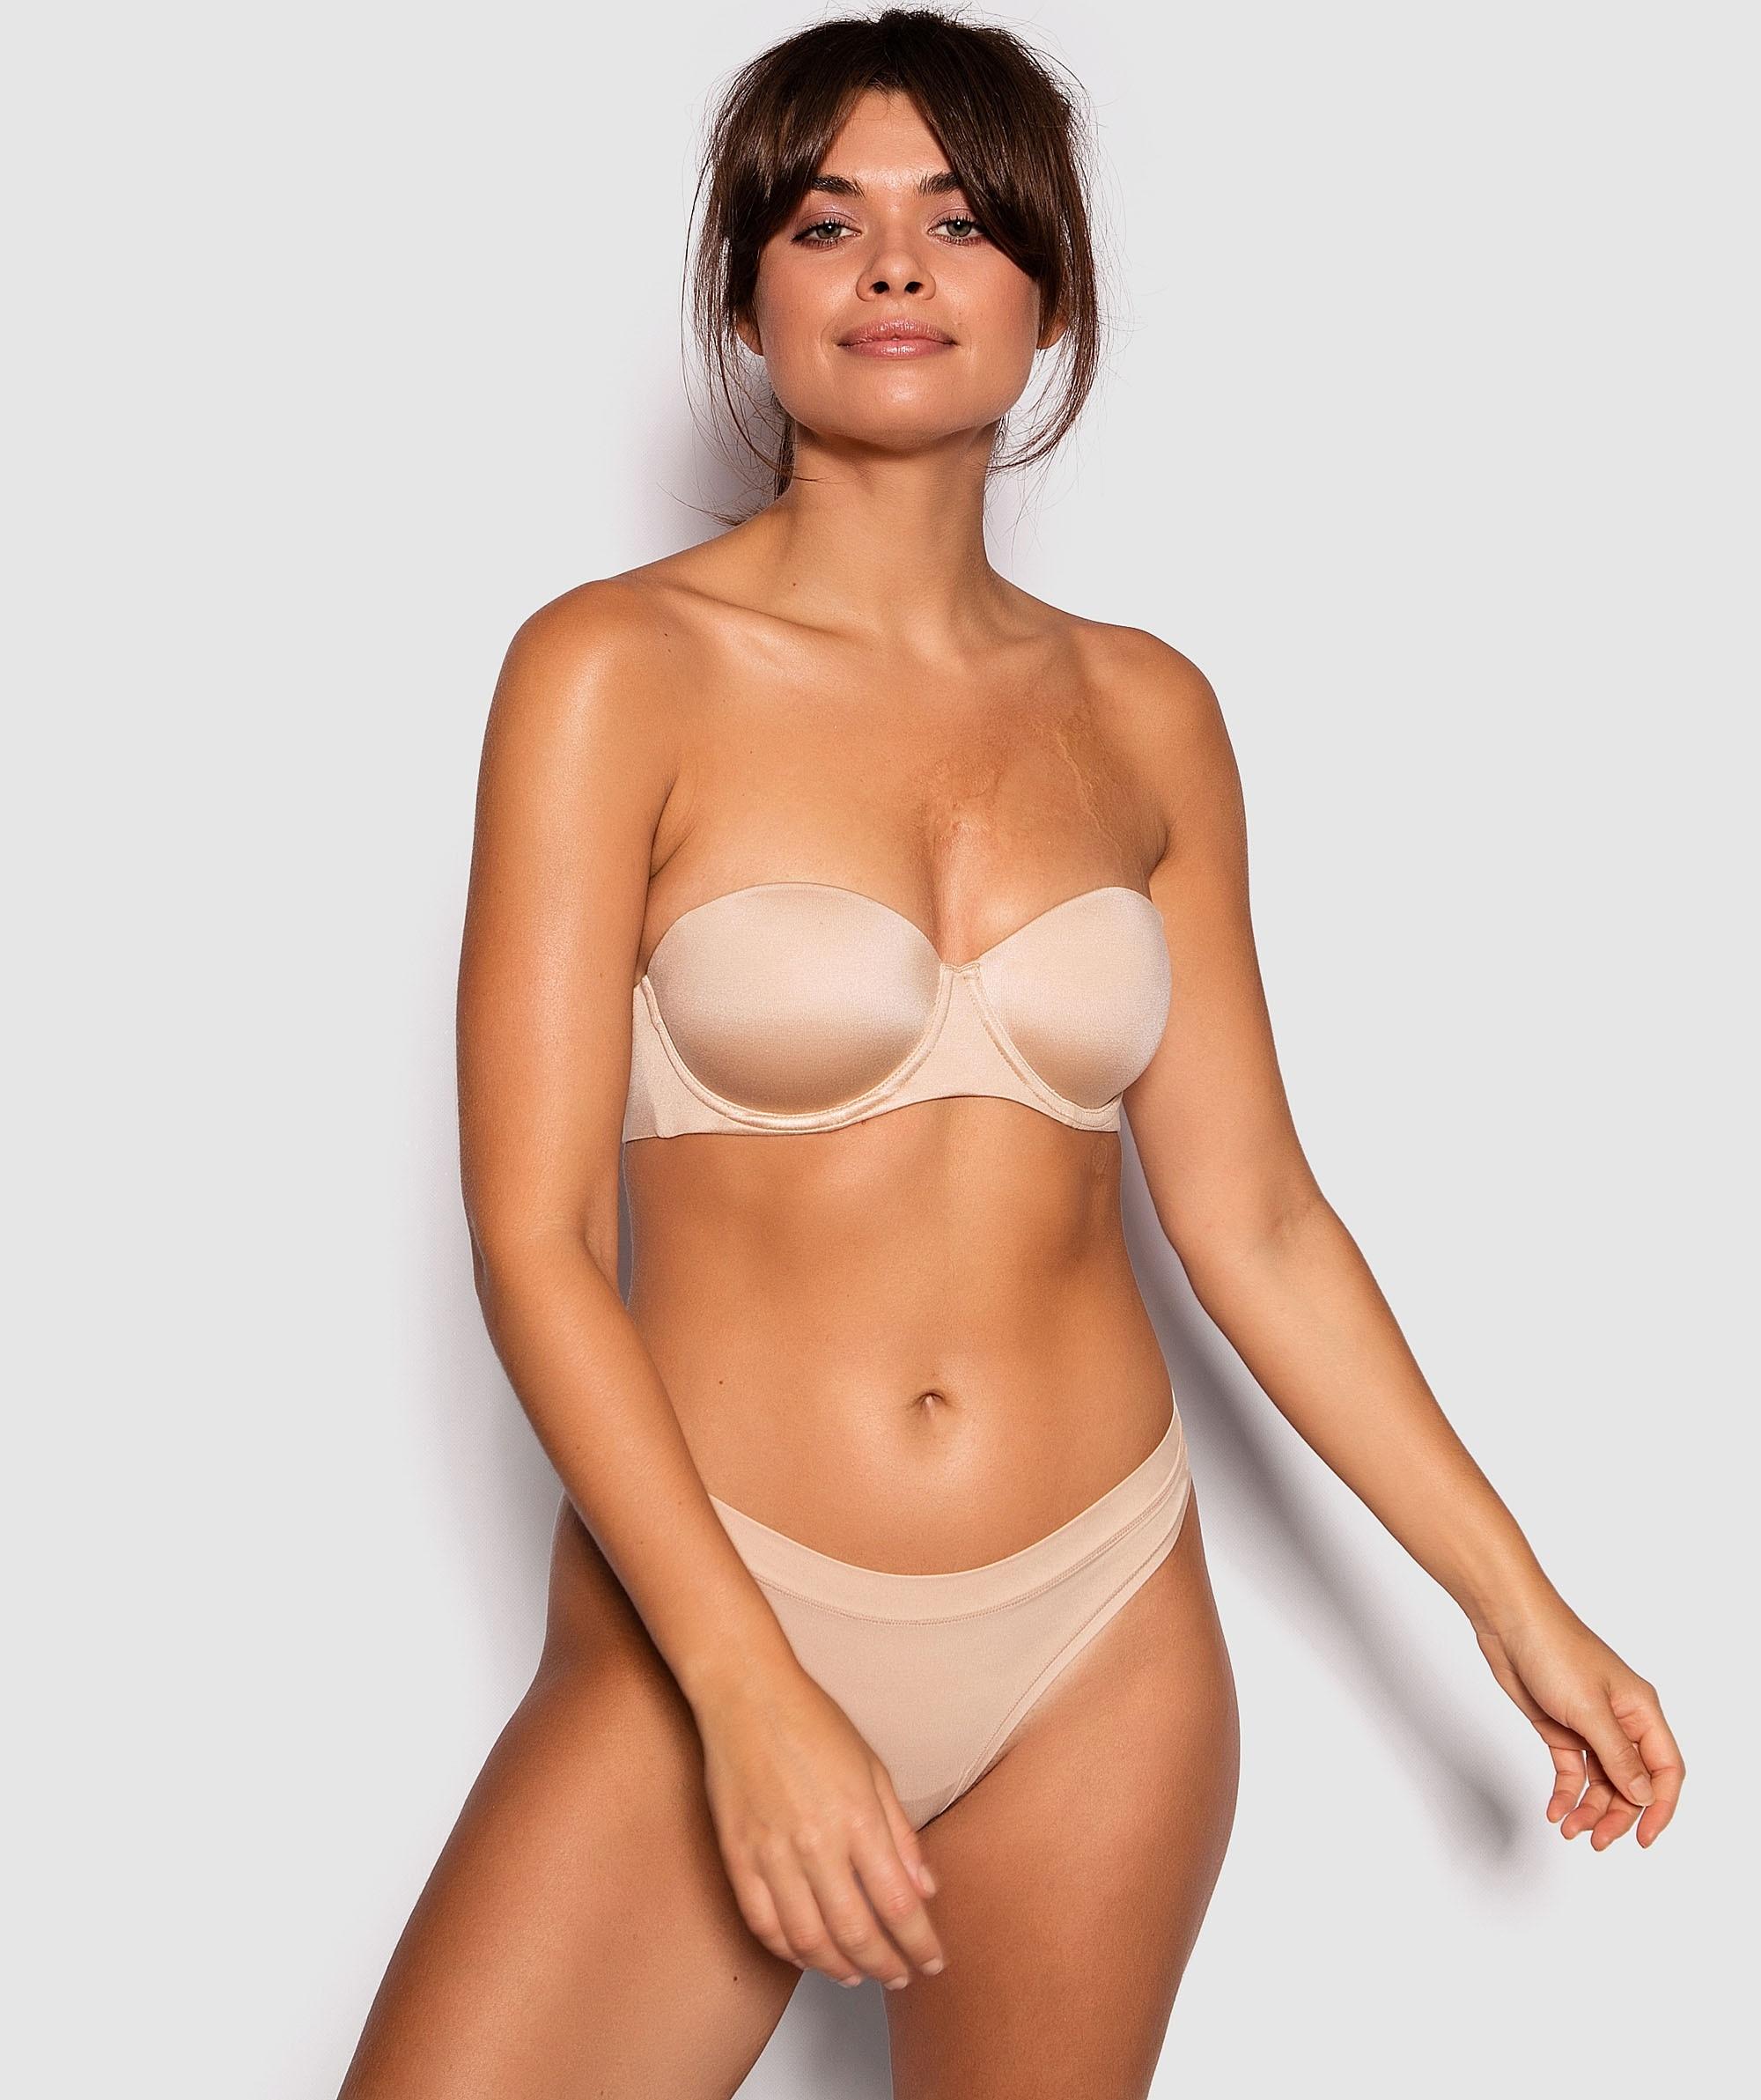 Body Bliss 2nd Gen Strapless Contour Bra - Nude